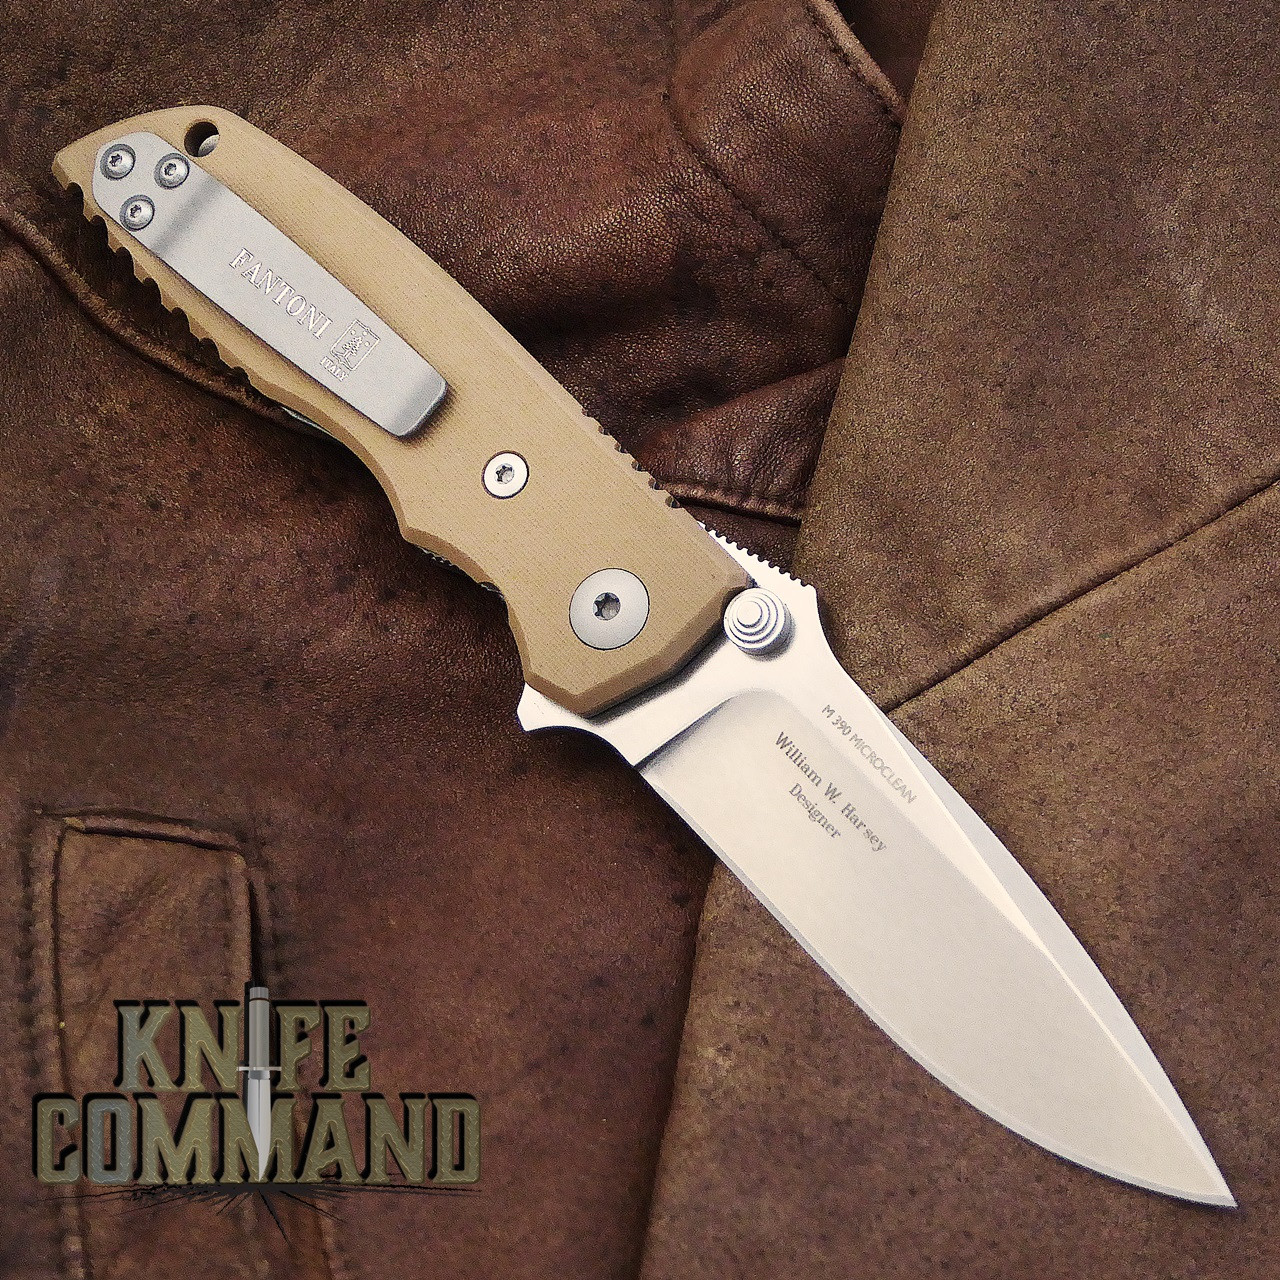 Fantoni HB 03 M390 William Harsey Combat Folder Tactical Knife Coyote Tan.  Titanium liners.